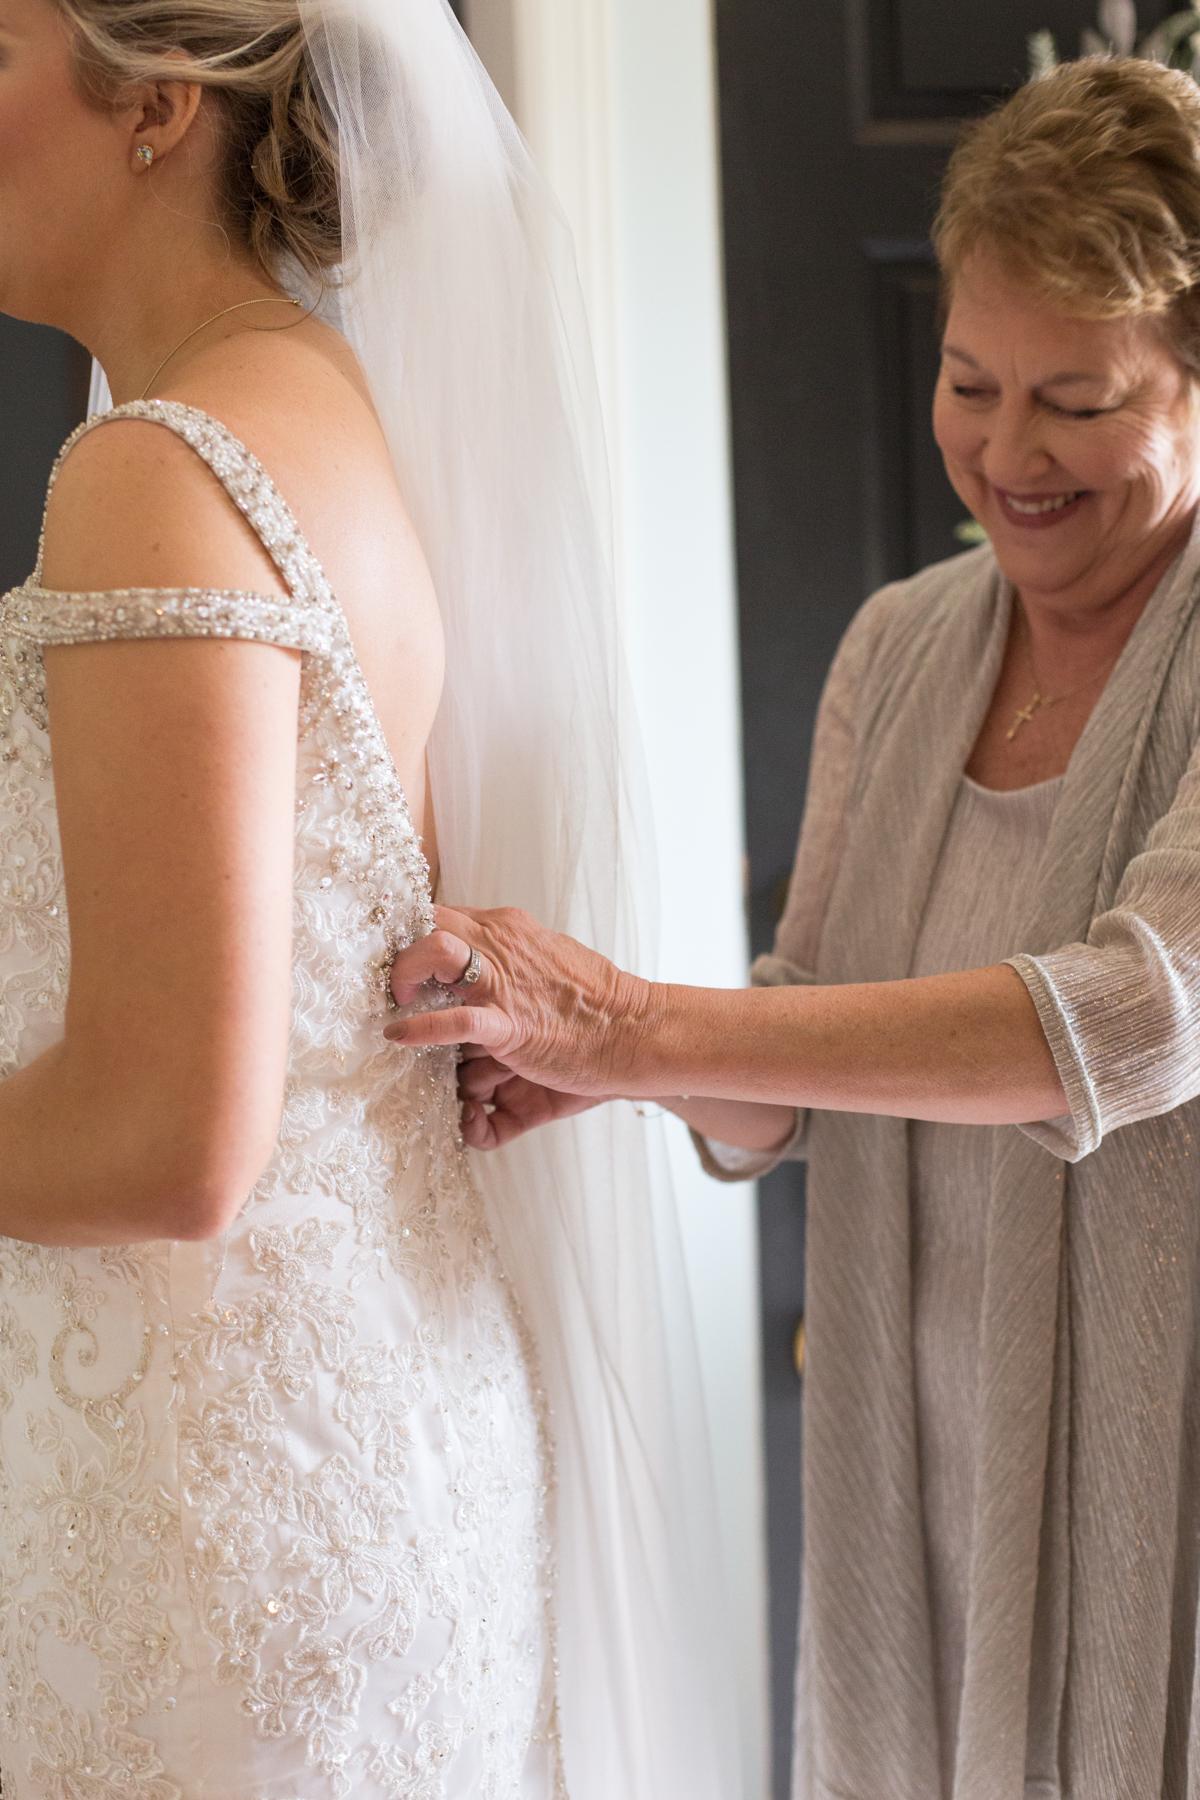 Kelli-and-Matt-Nashville-Wedding-Sneak-Peak-0062.jpg